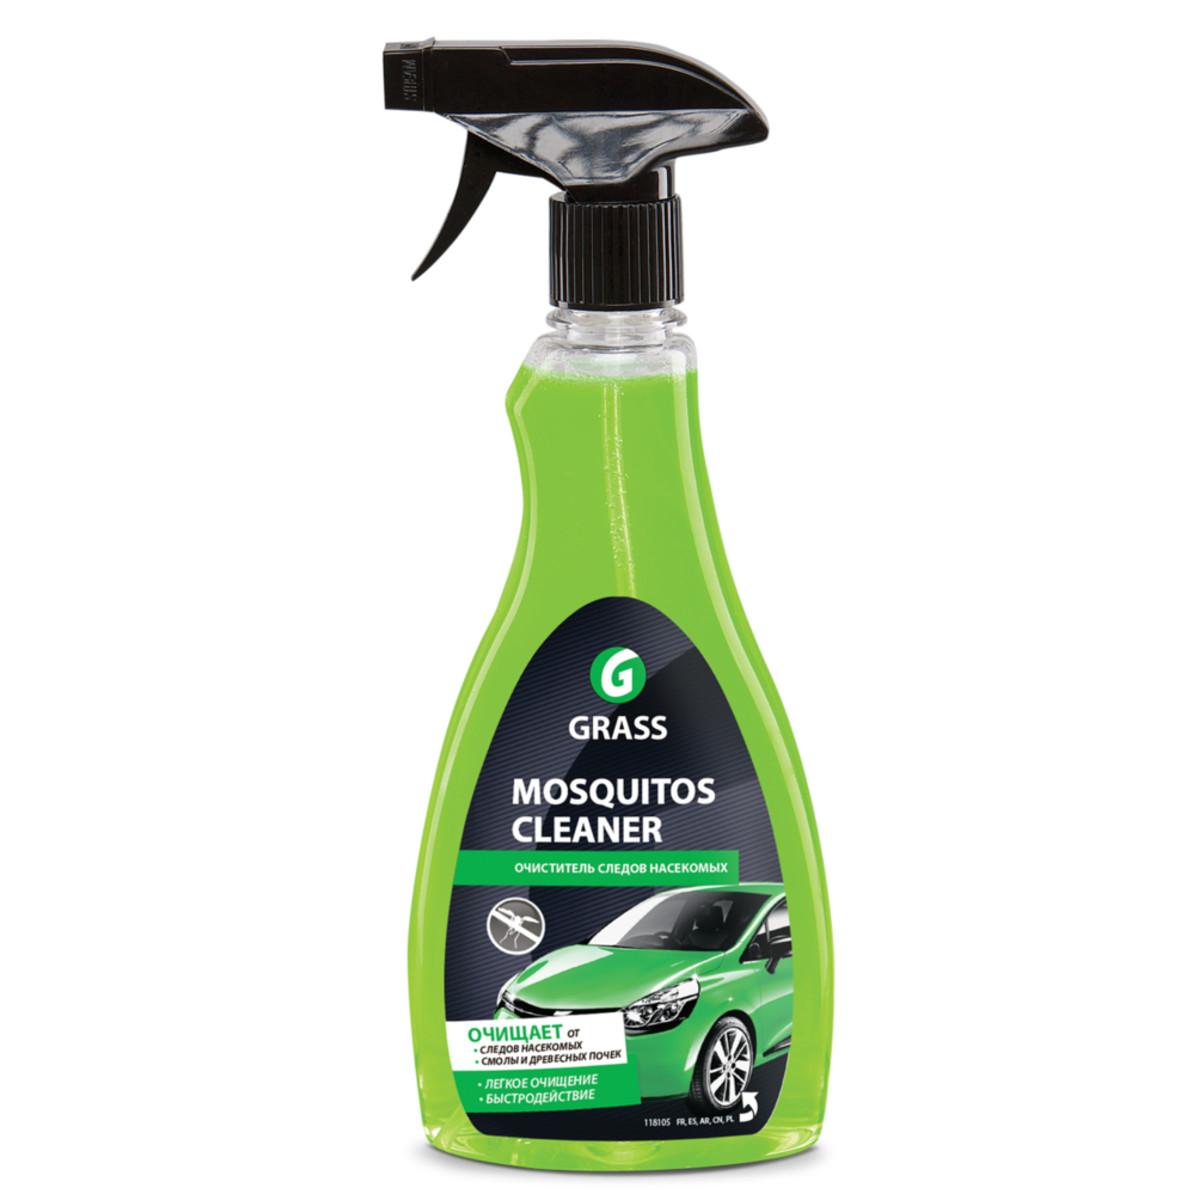 Анти-москитное средство Grass Mosquitos Cleaner 0.5 л